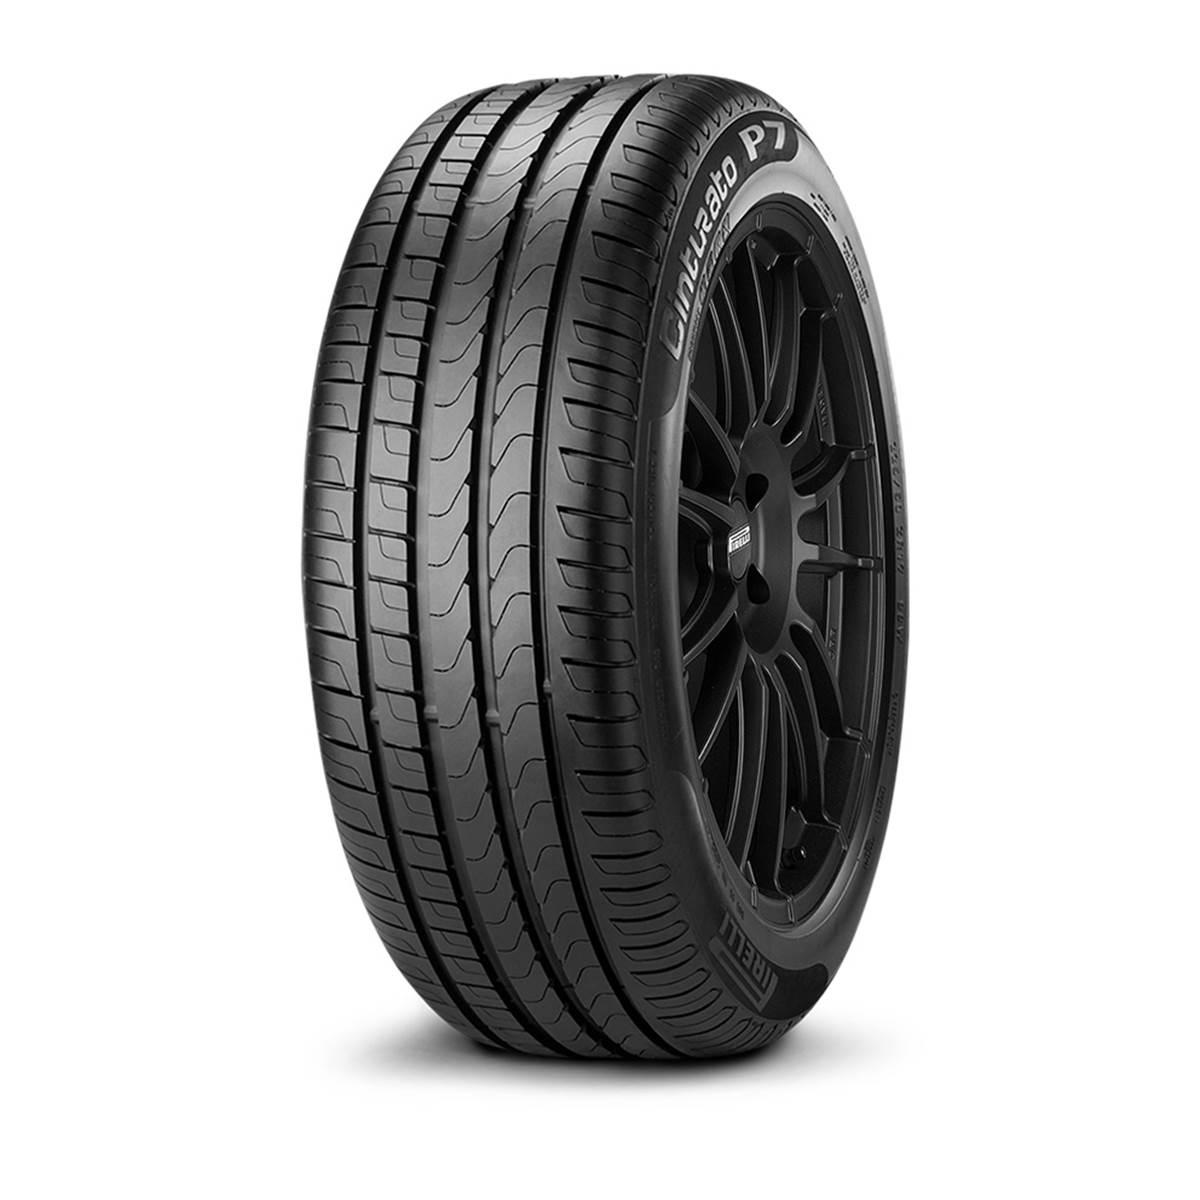 Pneu Pirelli 235/45R18 94W Cinturato P7